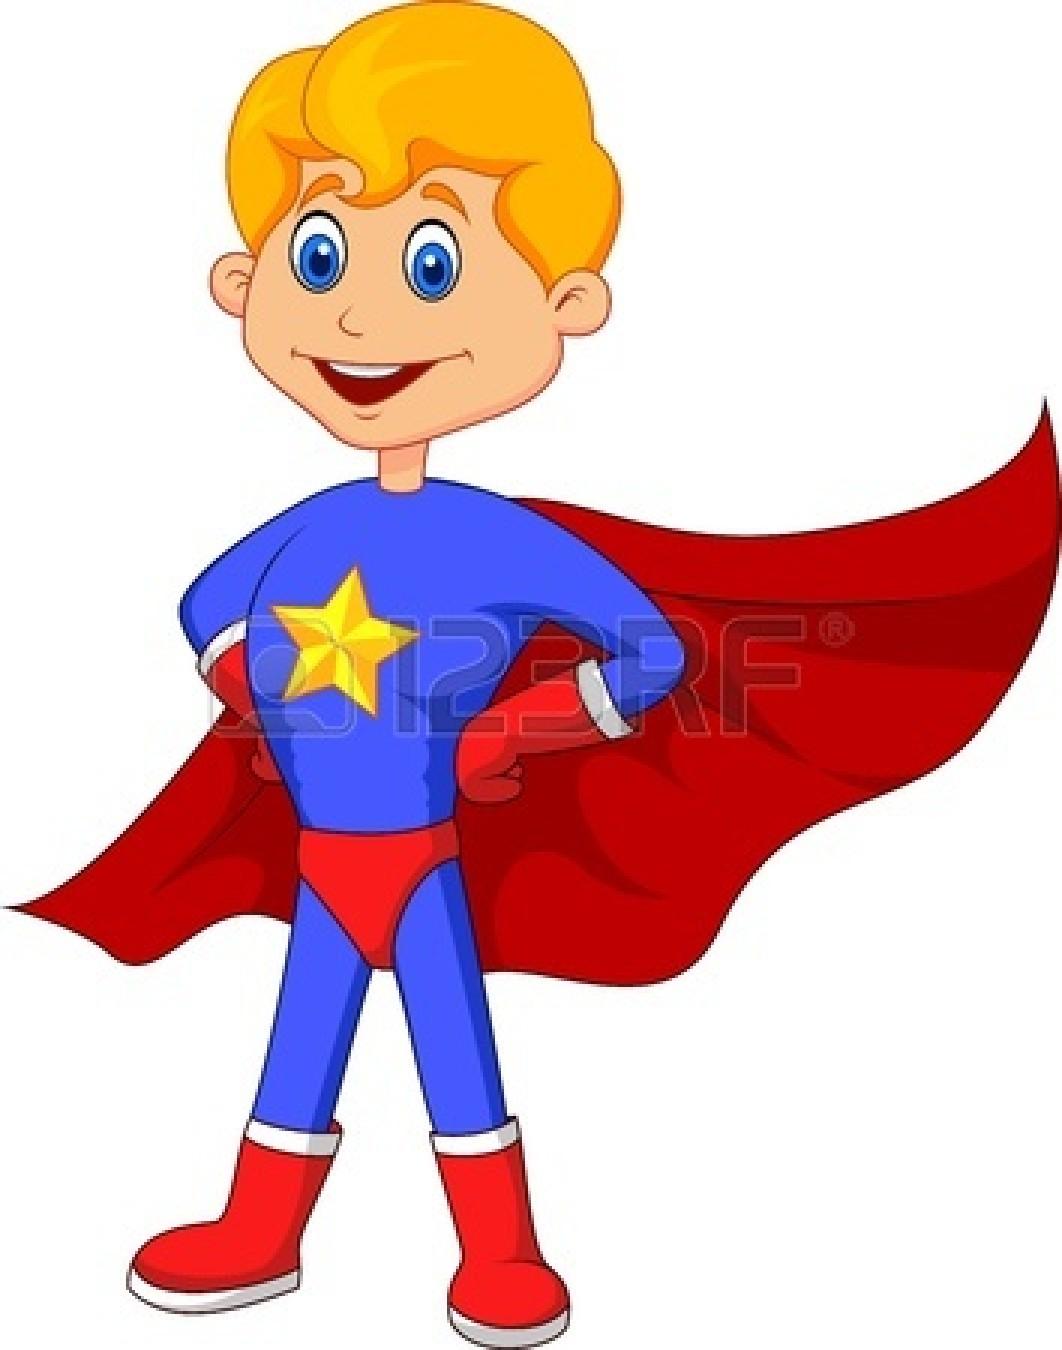 Superman cape clipart